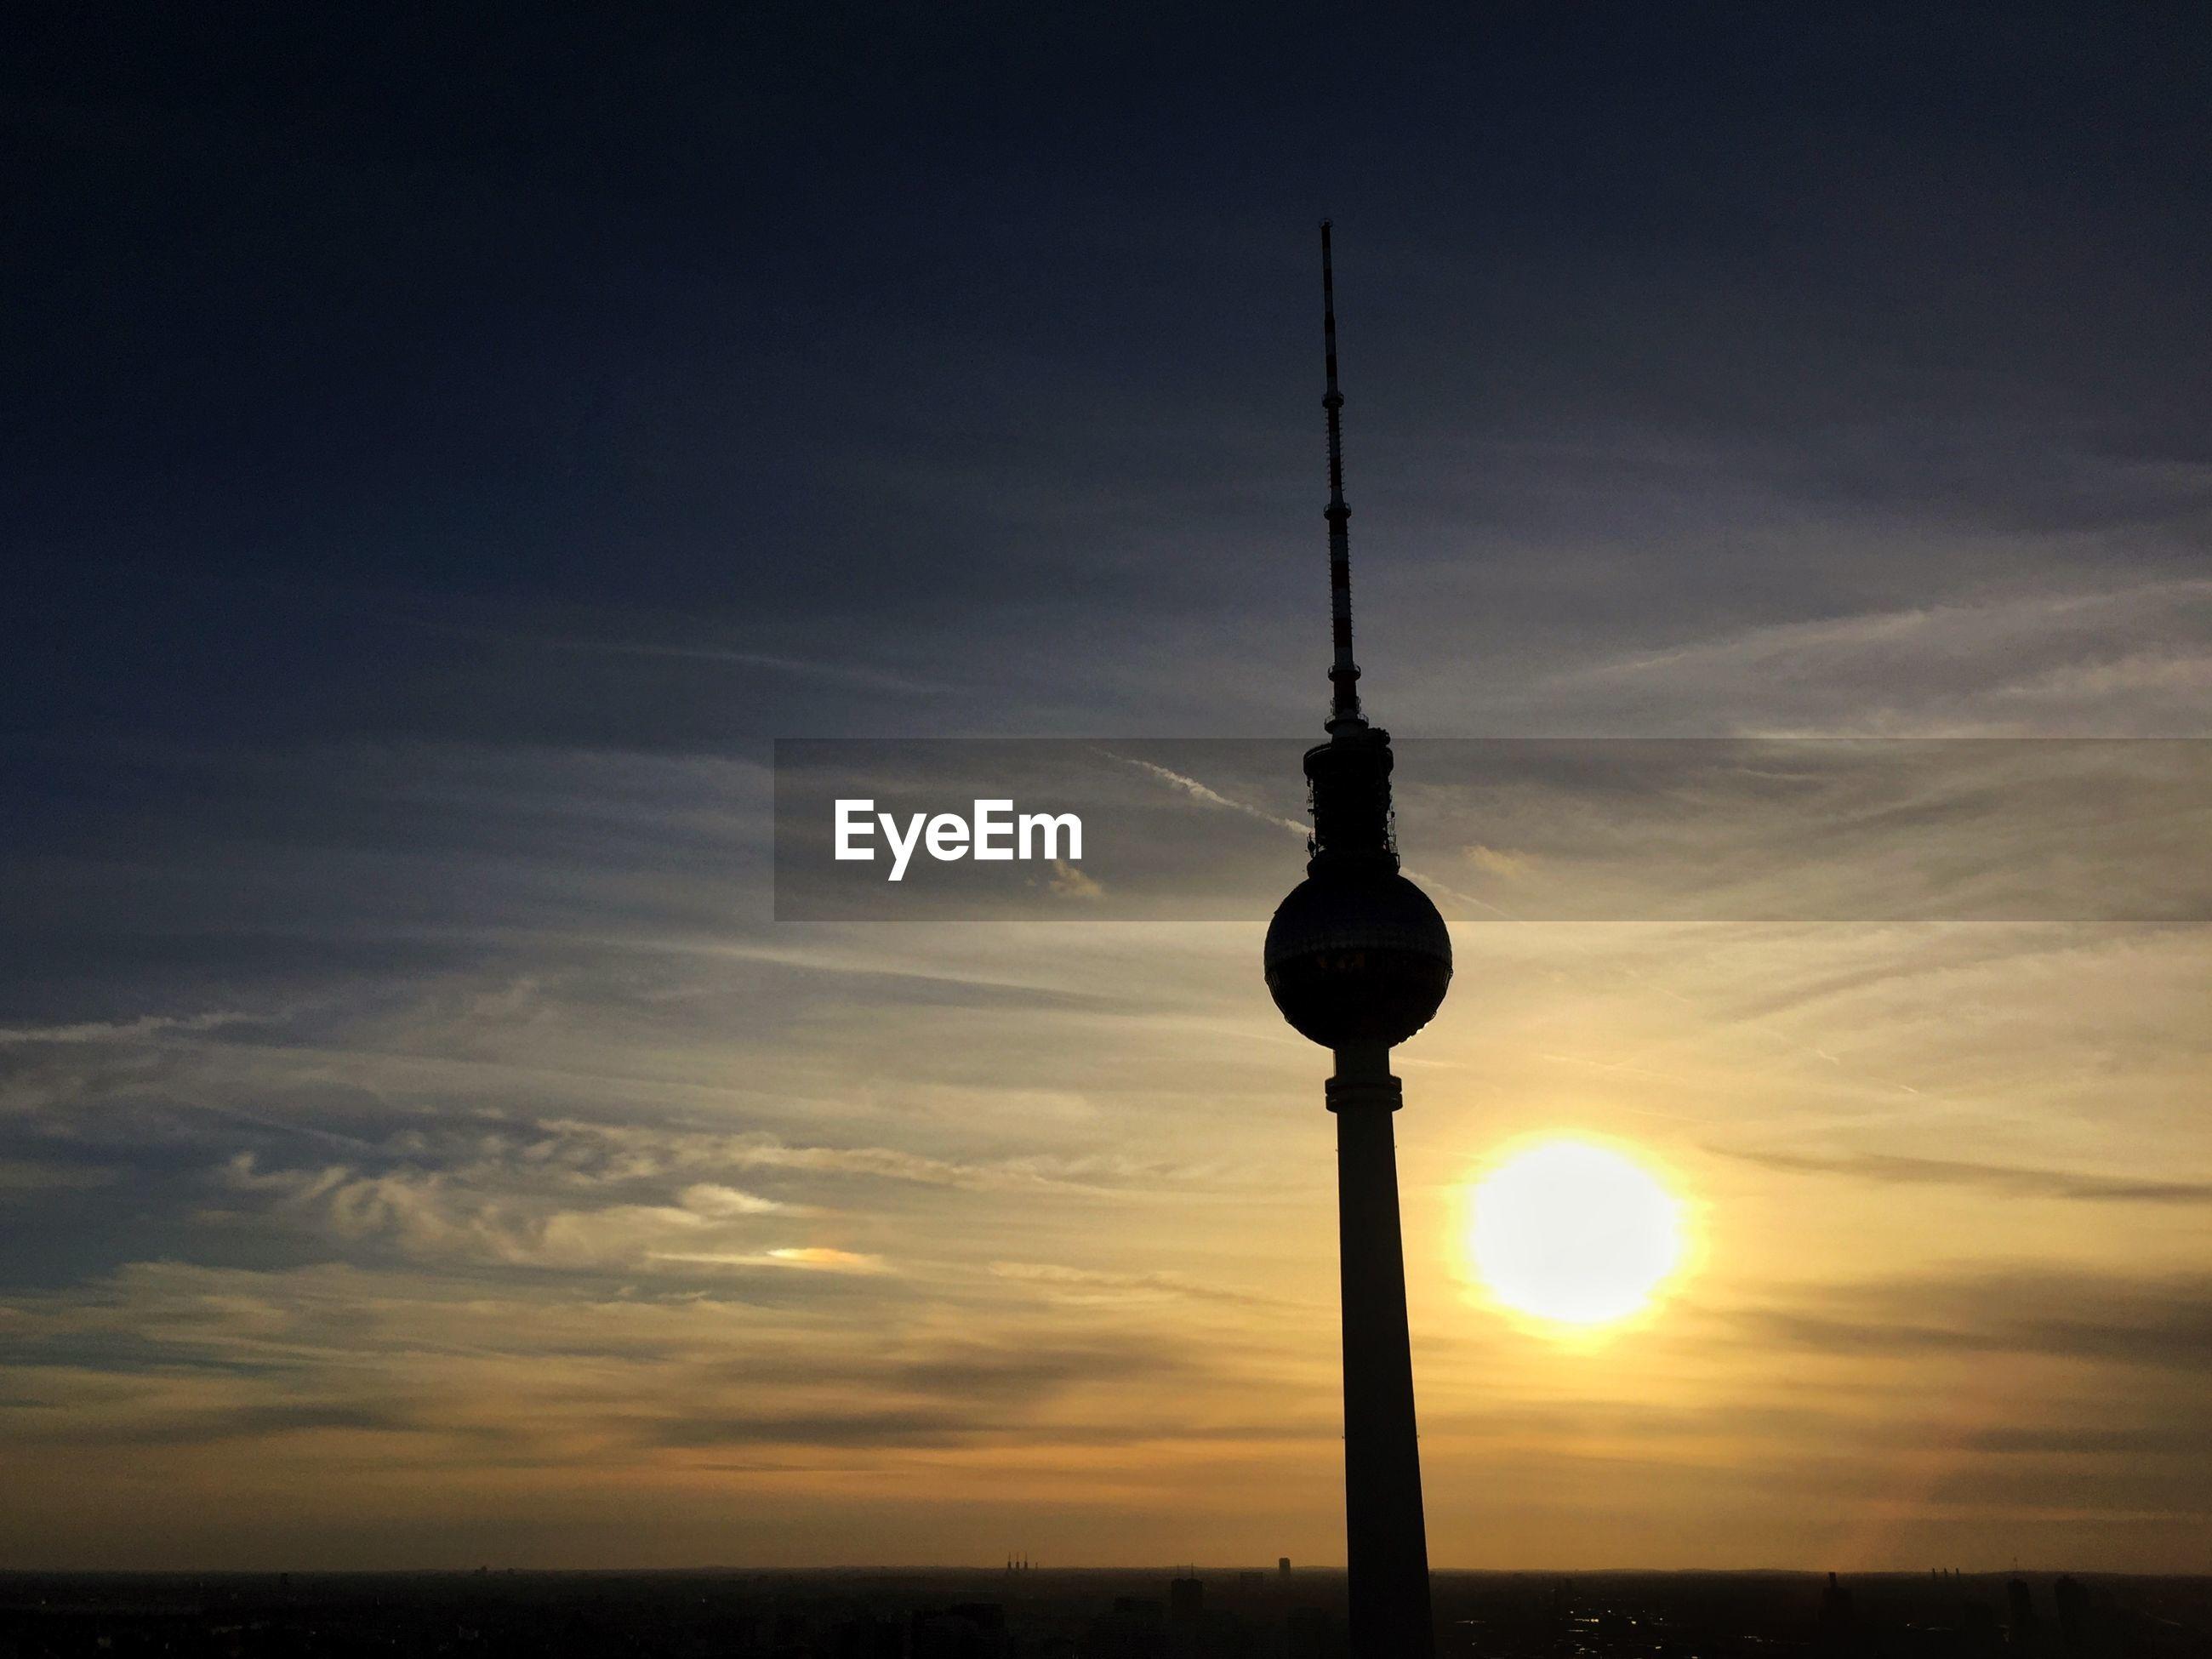 Silhouette fernsehturm against sky during sunset